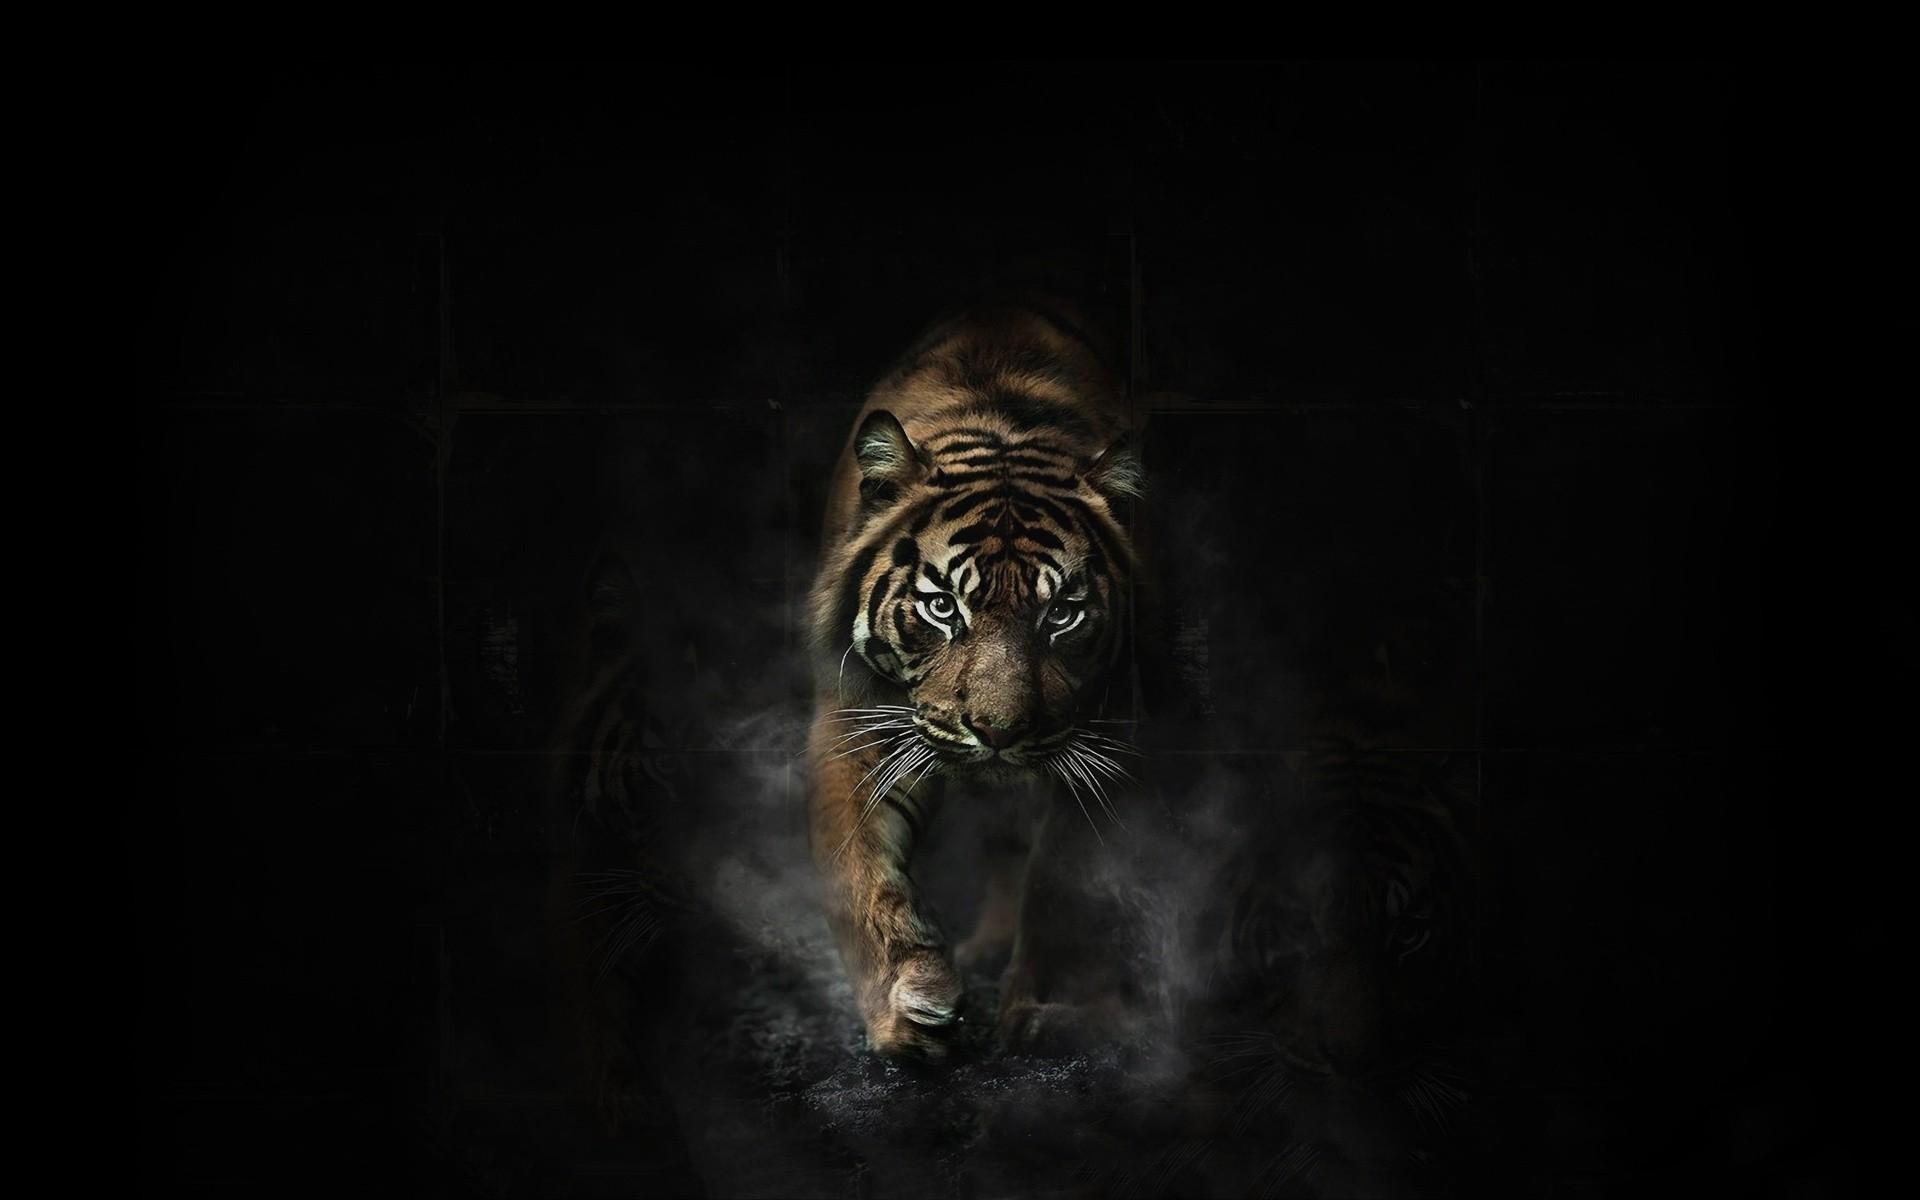 1920x1080 4 Tiger Iphone Wallpaper4 1 600x338